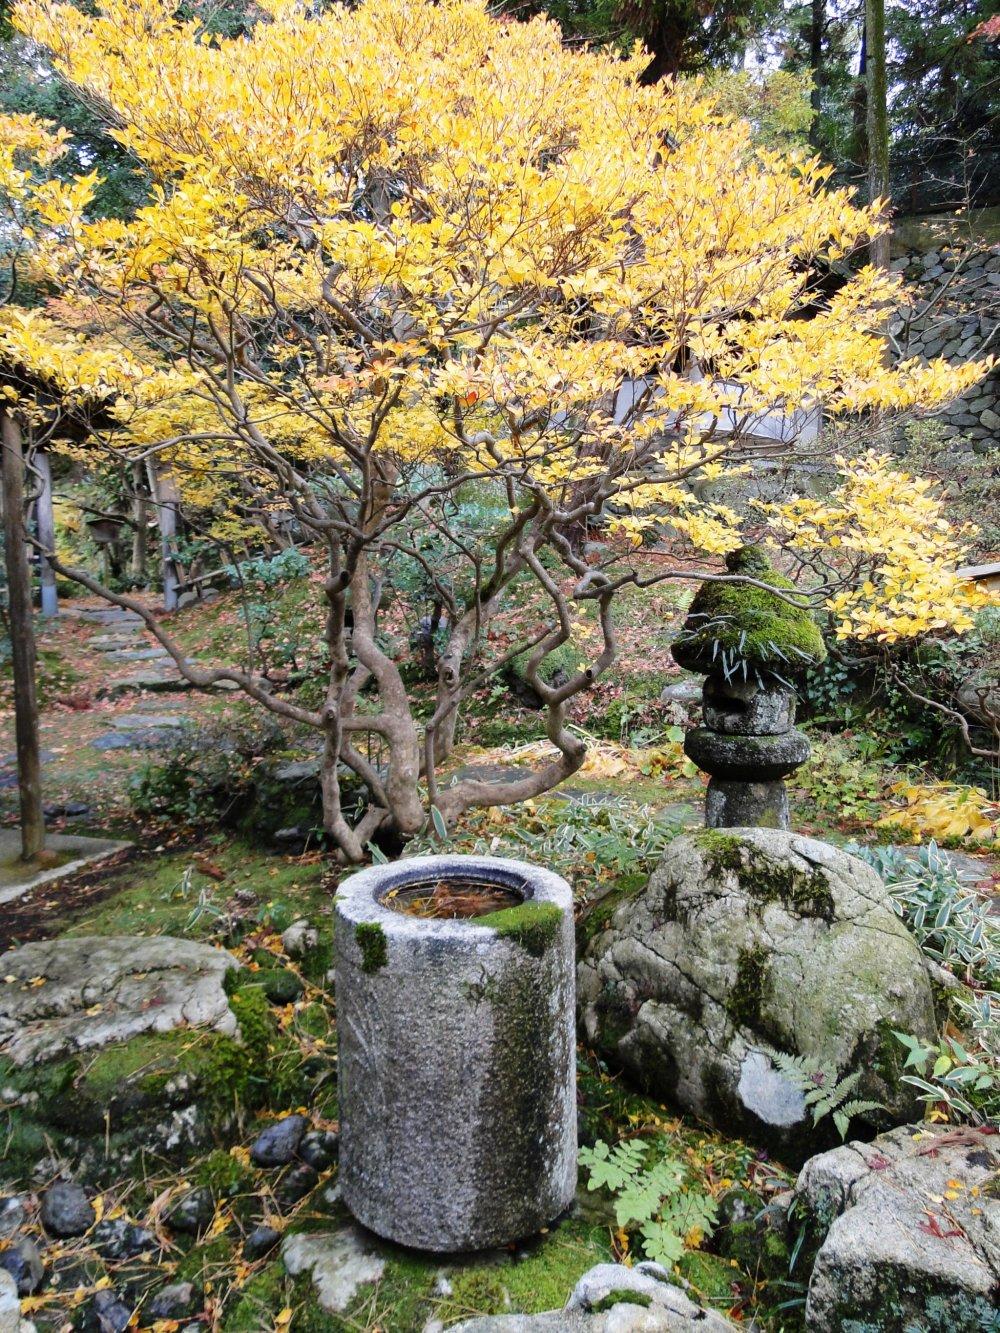 A uniquely-shaped chozubachi(water basin) in the garden